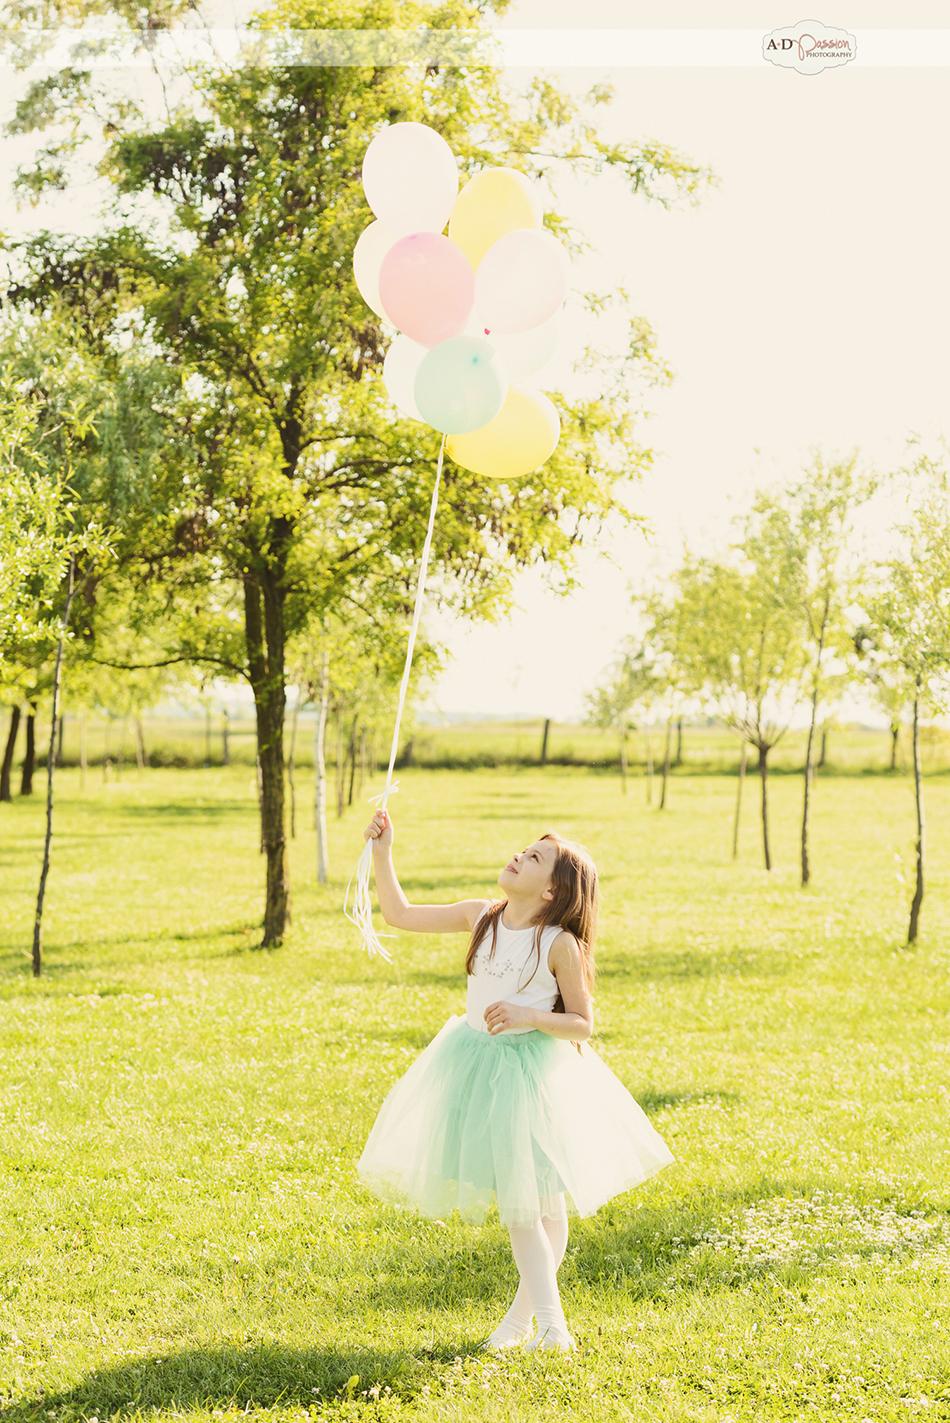 AD Passion Photography | party-fetite-fotograf-copii-timisoara_0015 | Adelin, Dida, fotograf profesionist, fotograf de nunta, fotografie de nunta, fotograf Timisoara, fotograf Craiova, fotograf Bucuresti, fotograf Arad, nunta Timisoara, nunta Arad, nunta Bucuresti, nunta Craiova